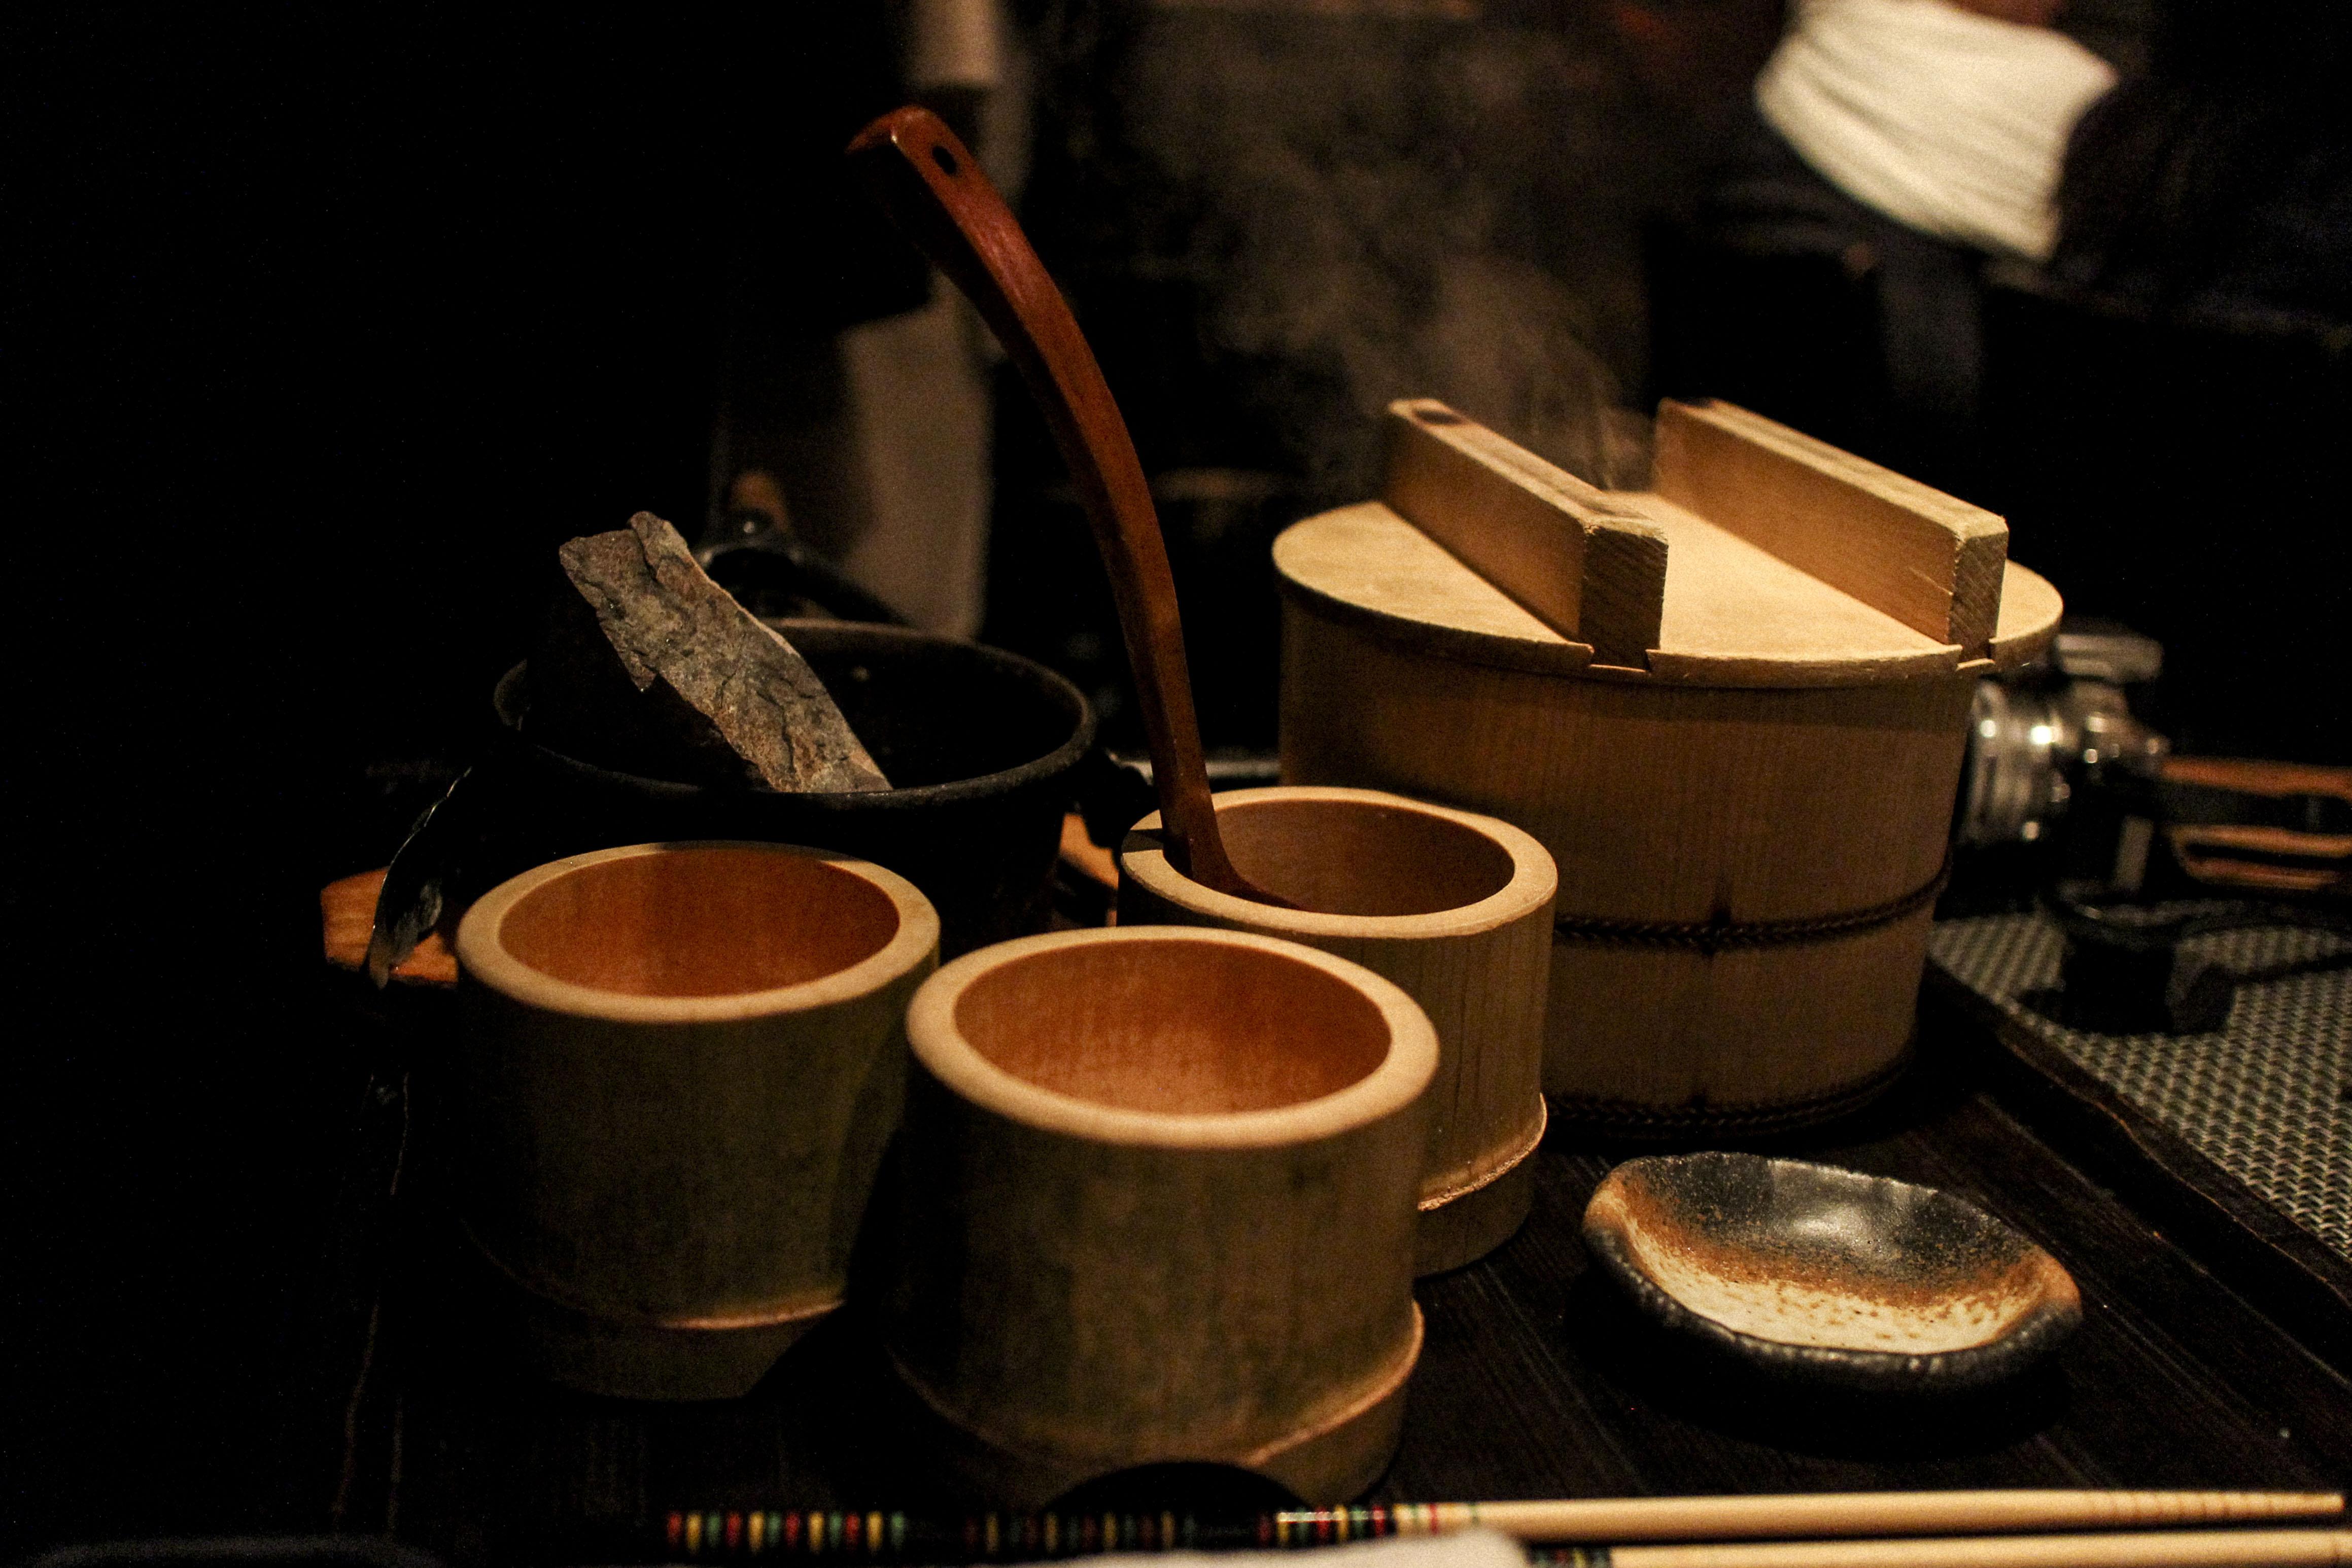 IHEARTALICE_tokyo_ninjarestaurant_01